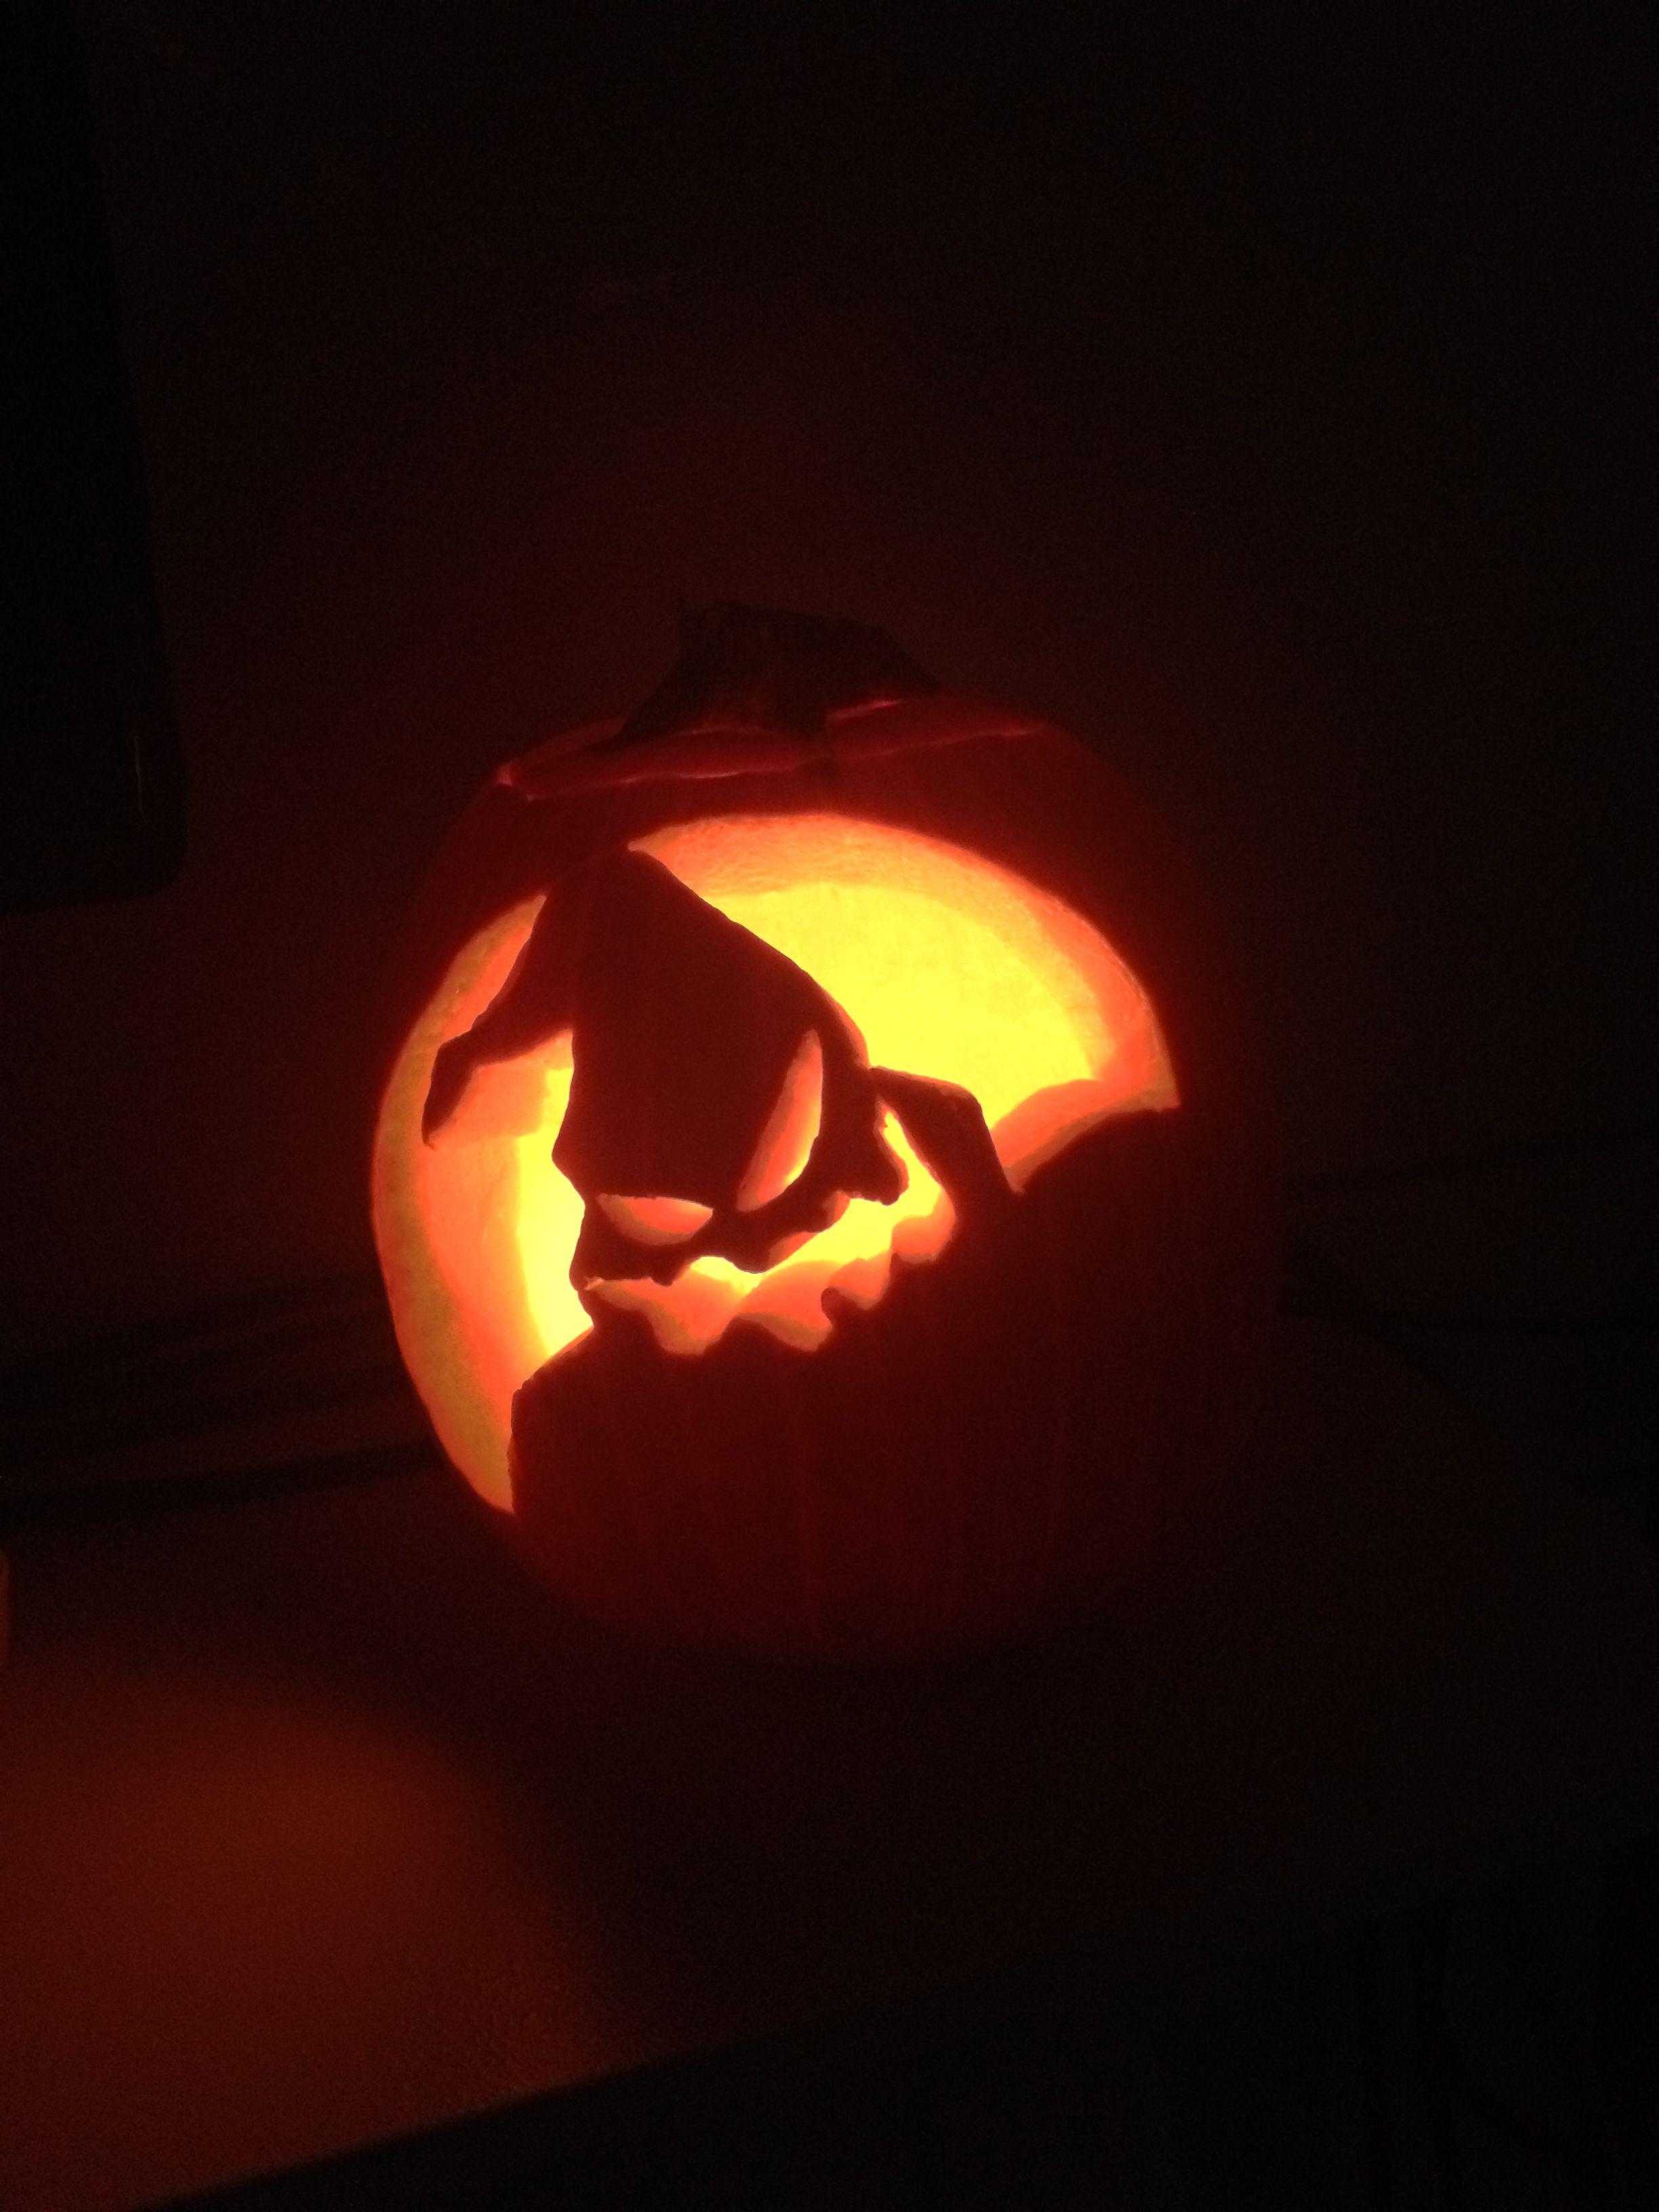 My first ever carved pumpkin free hand no stencils mr